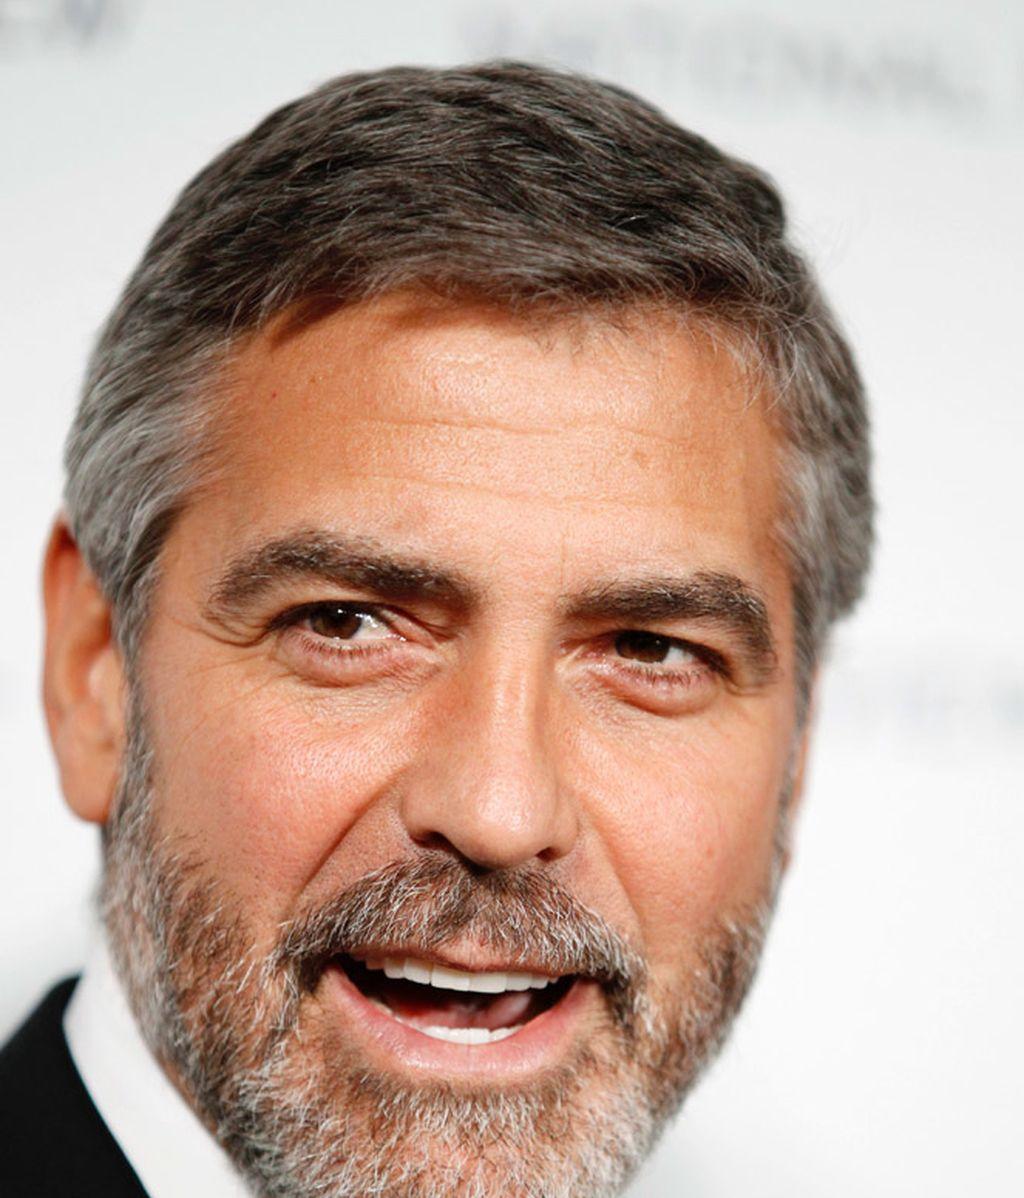 Georeg Clooney